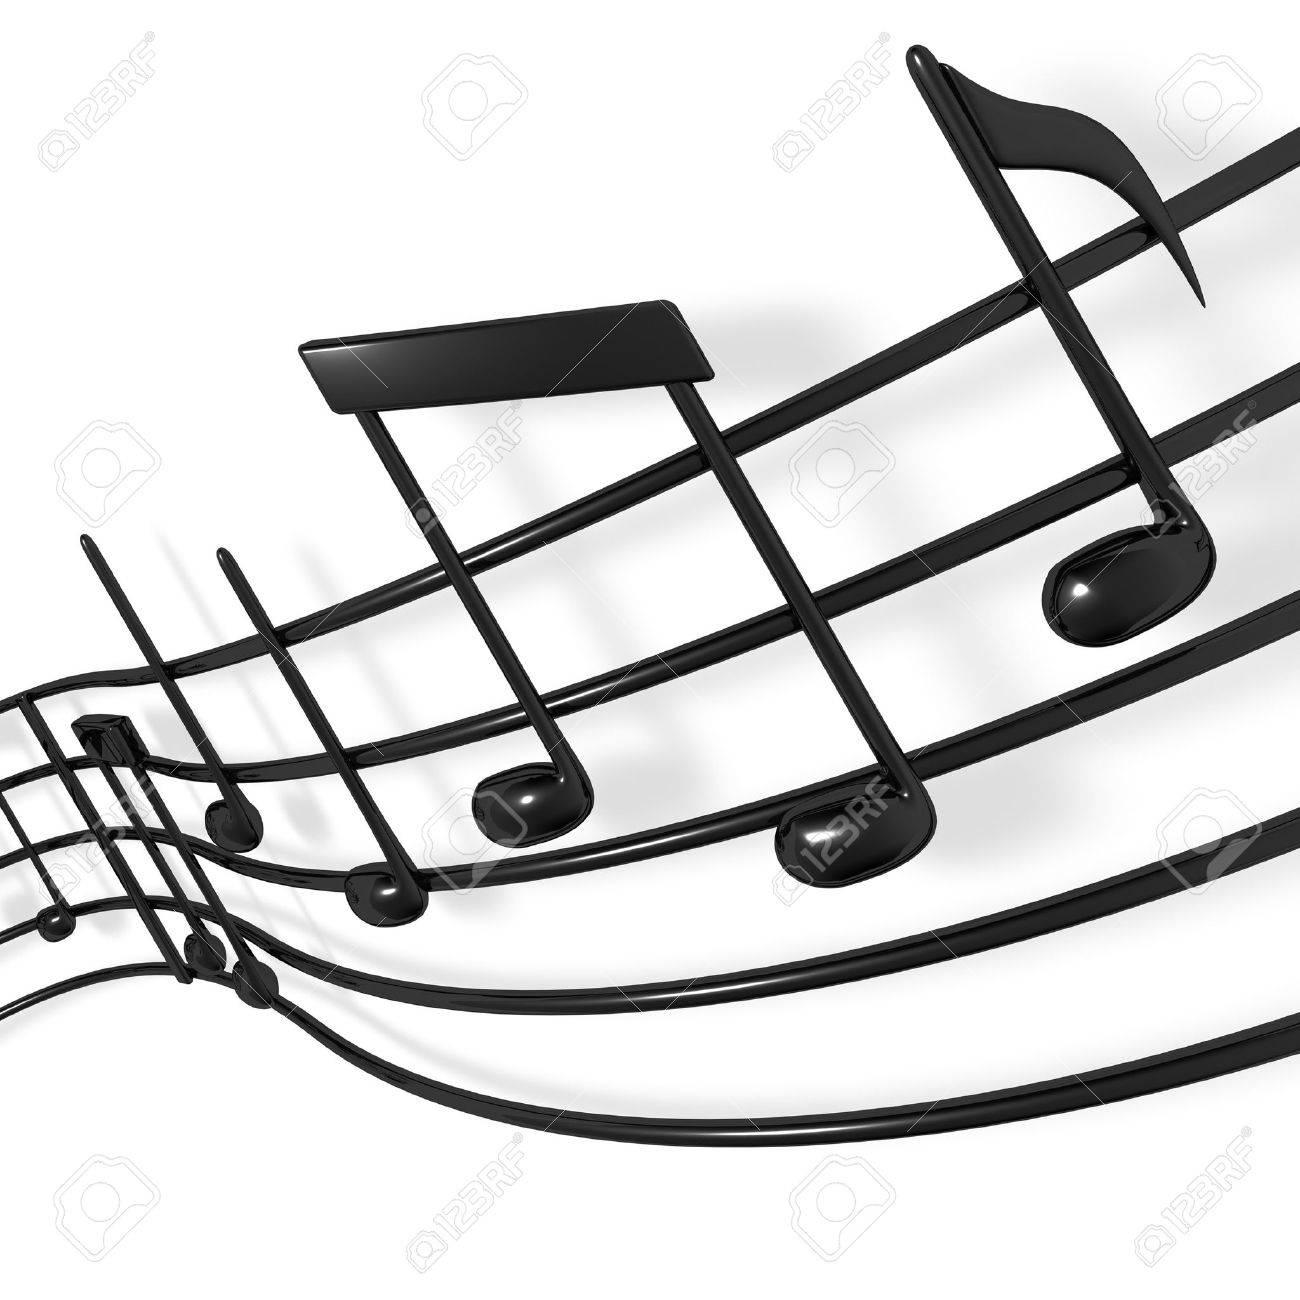 A musical score waving and bending towards the camera Standard-Bild - 7049781